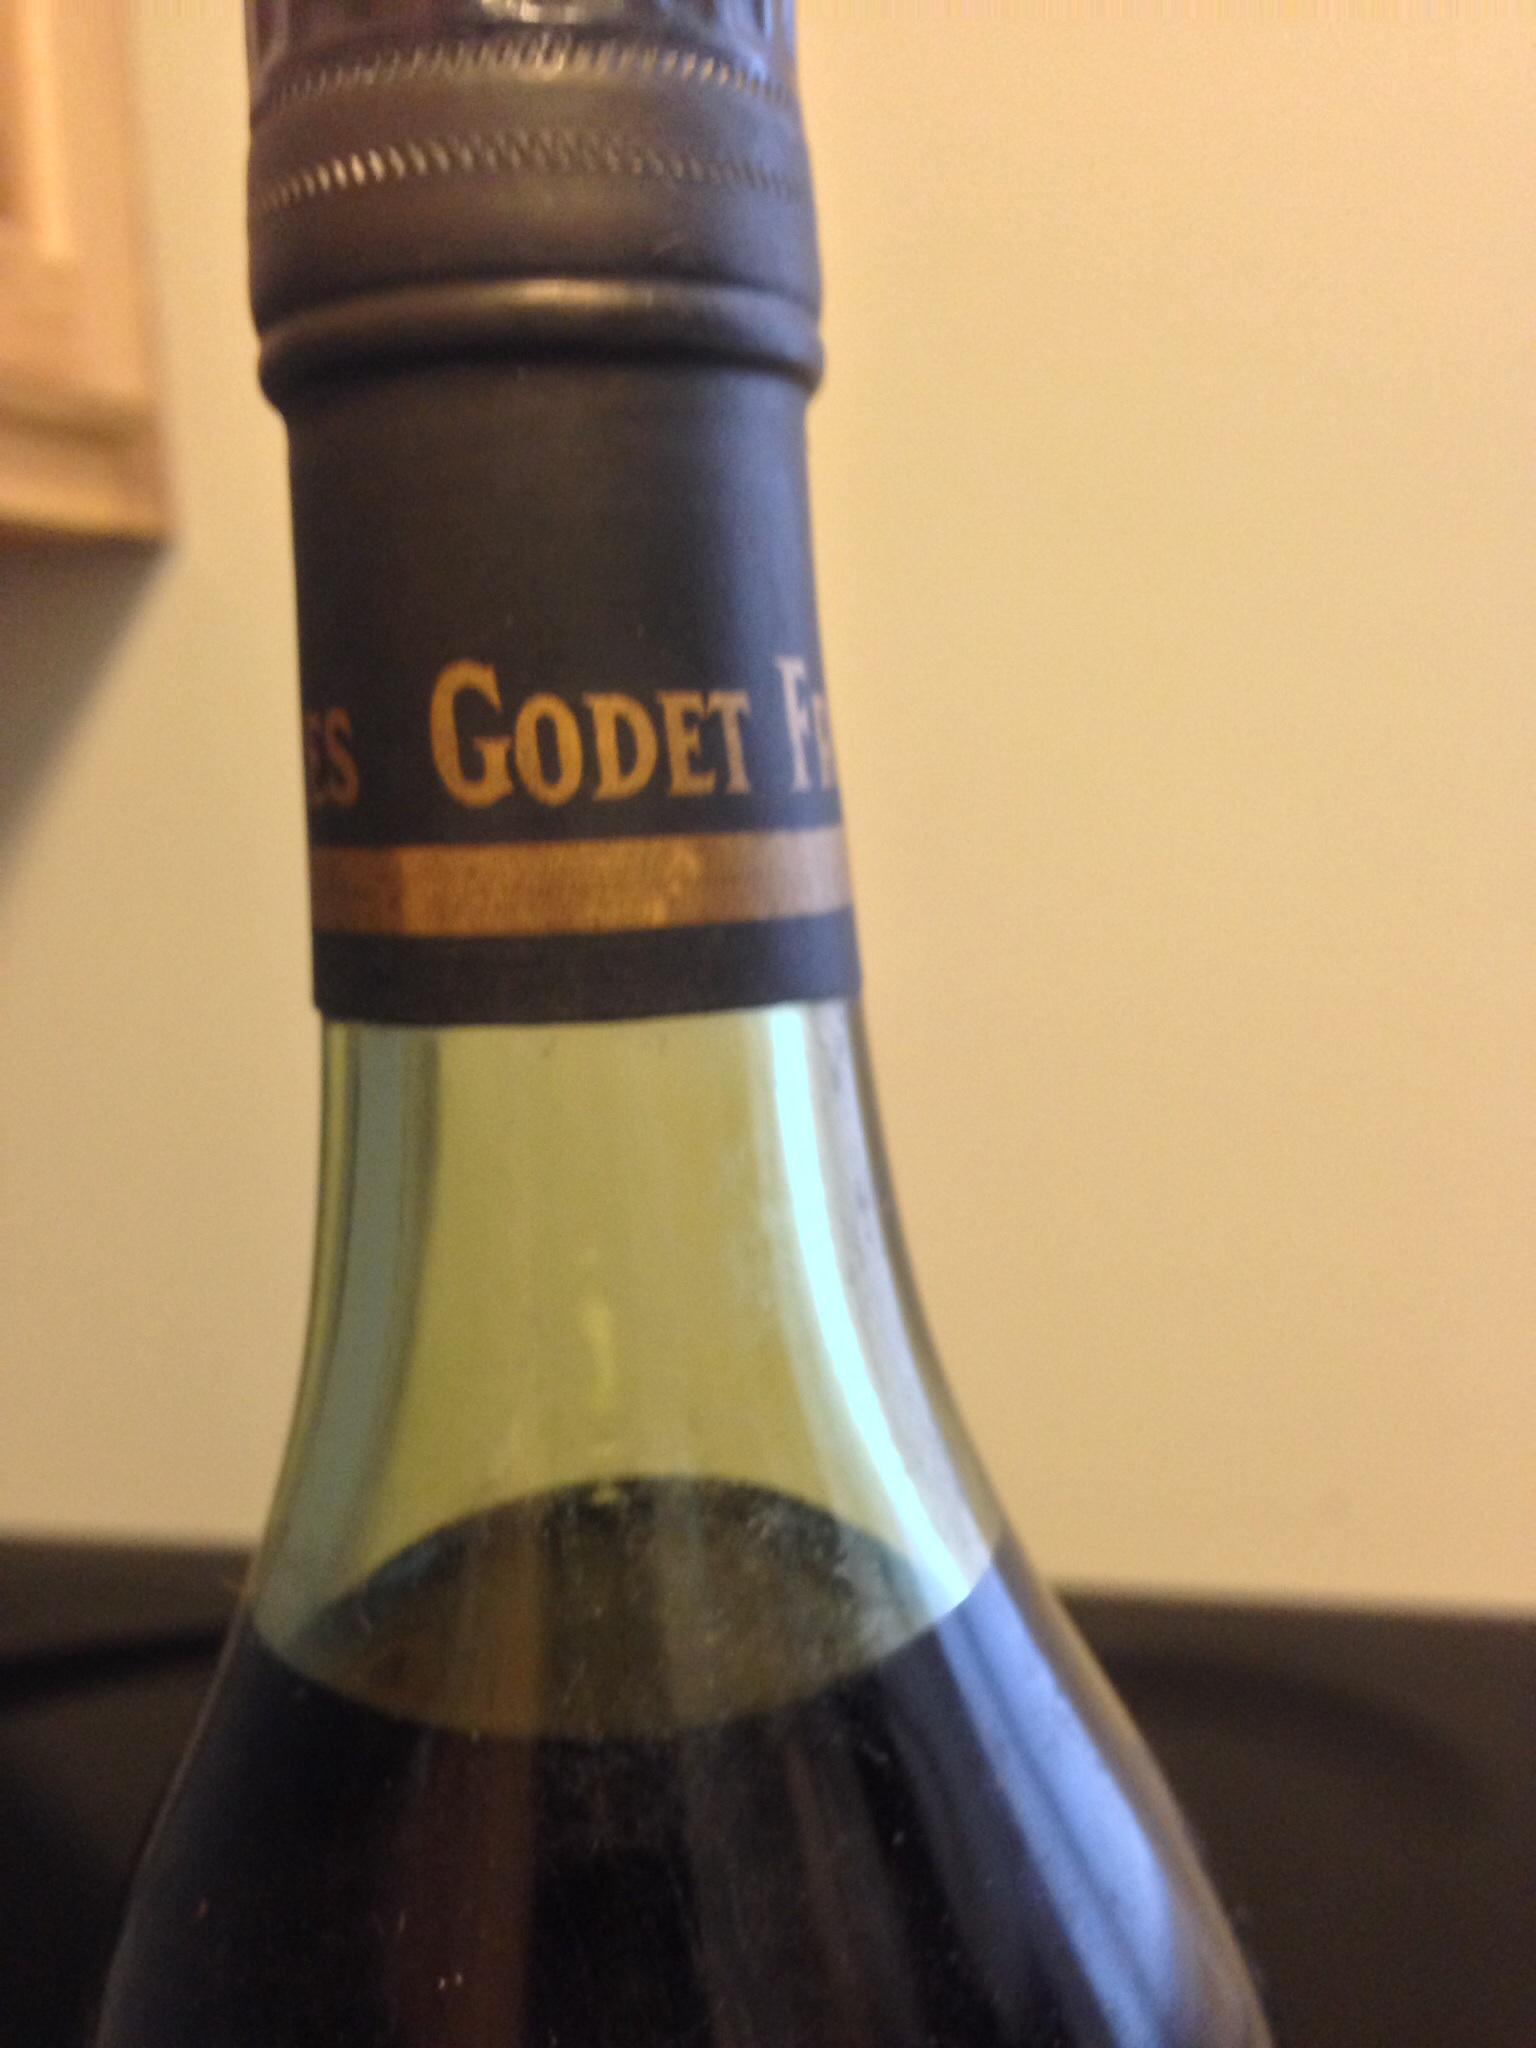 Godet Cask No. 32 Cognac